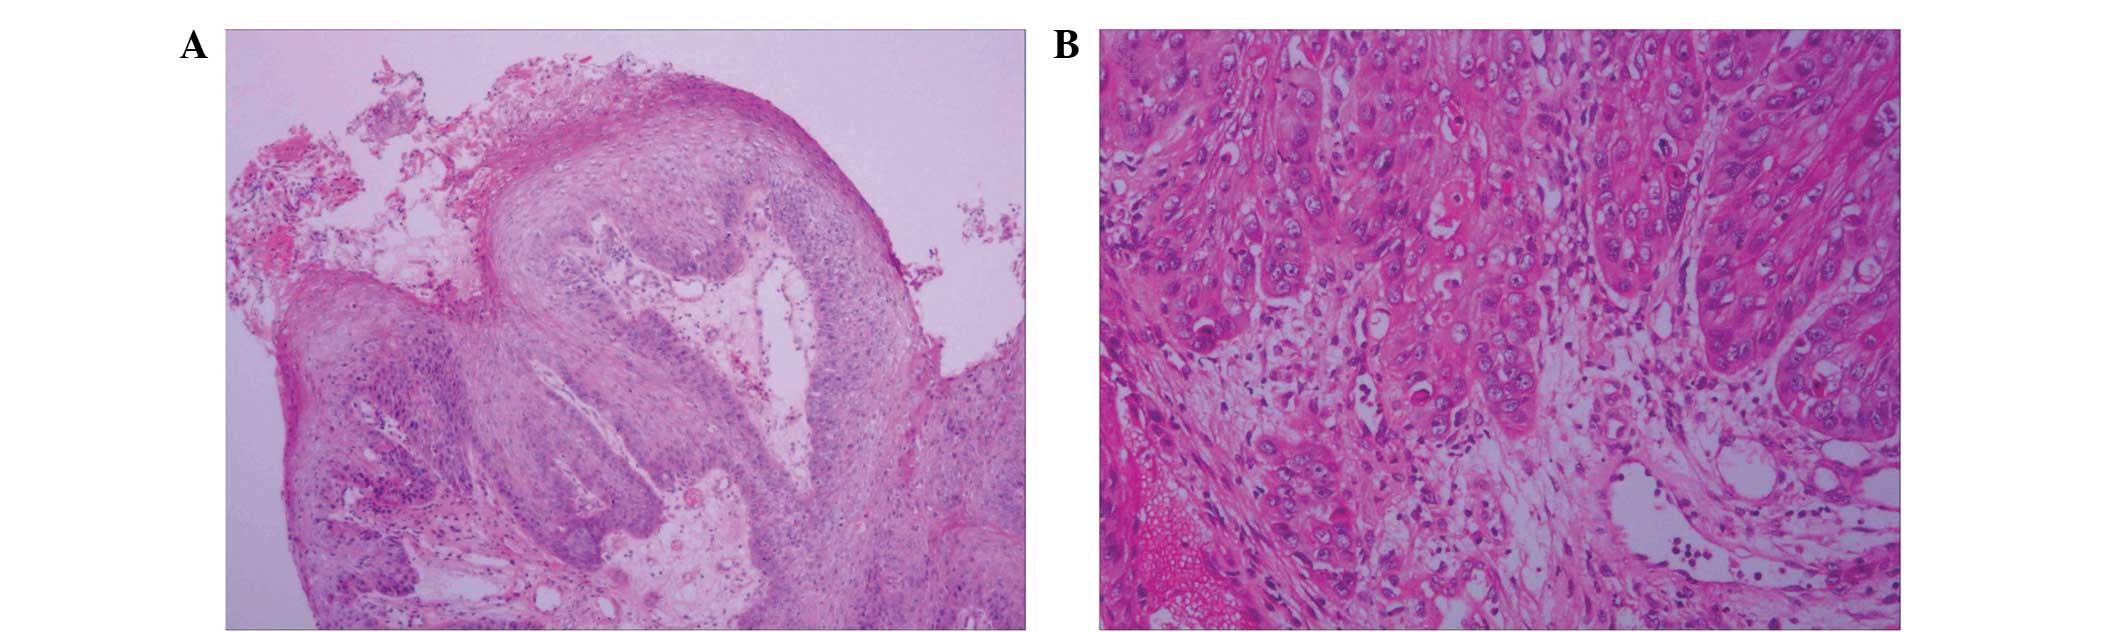 bowel cancer hepatic flexure